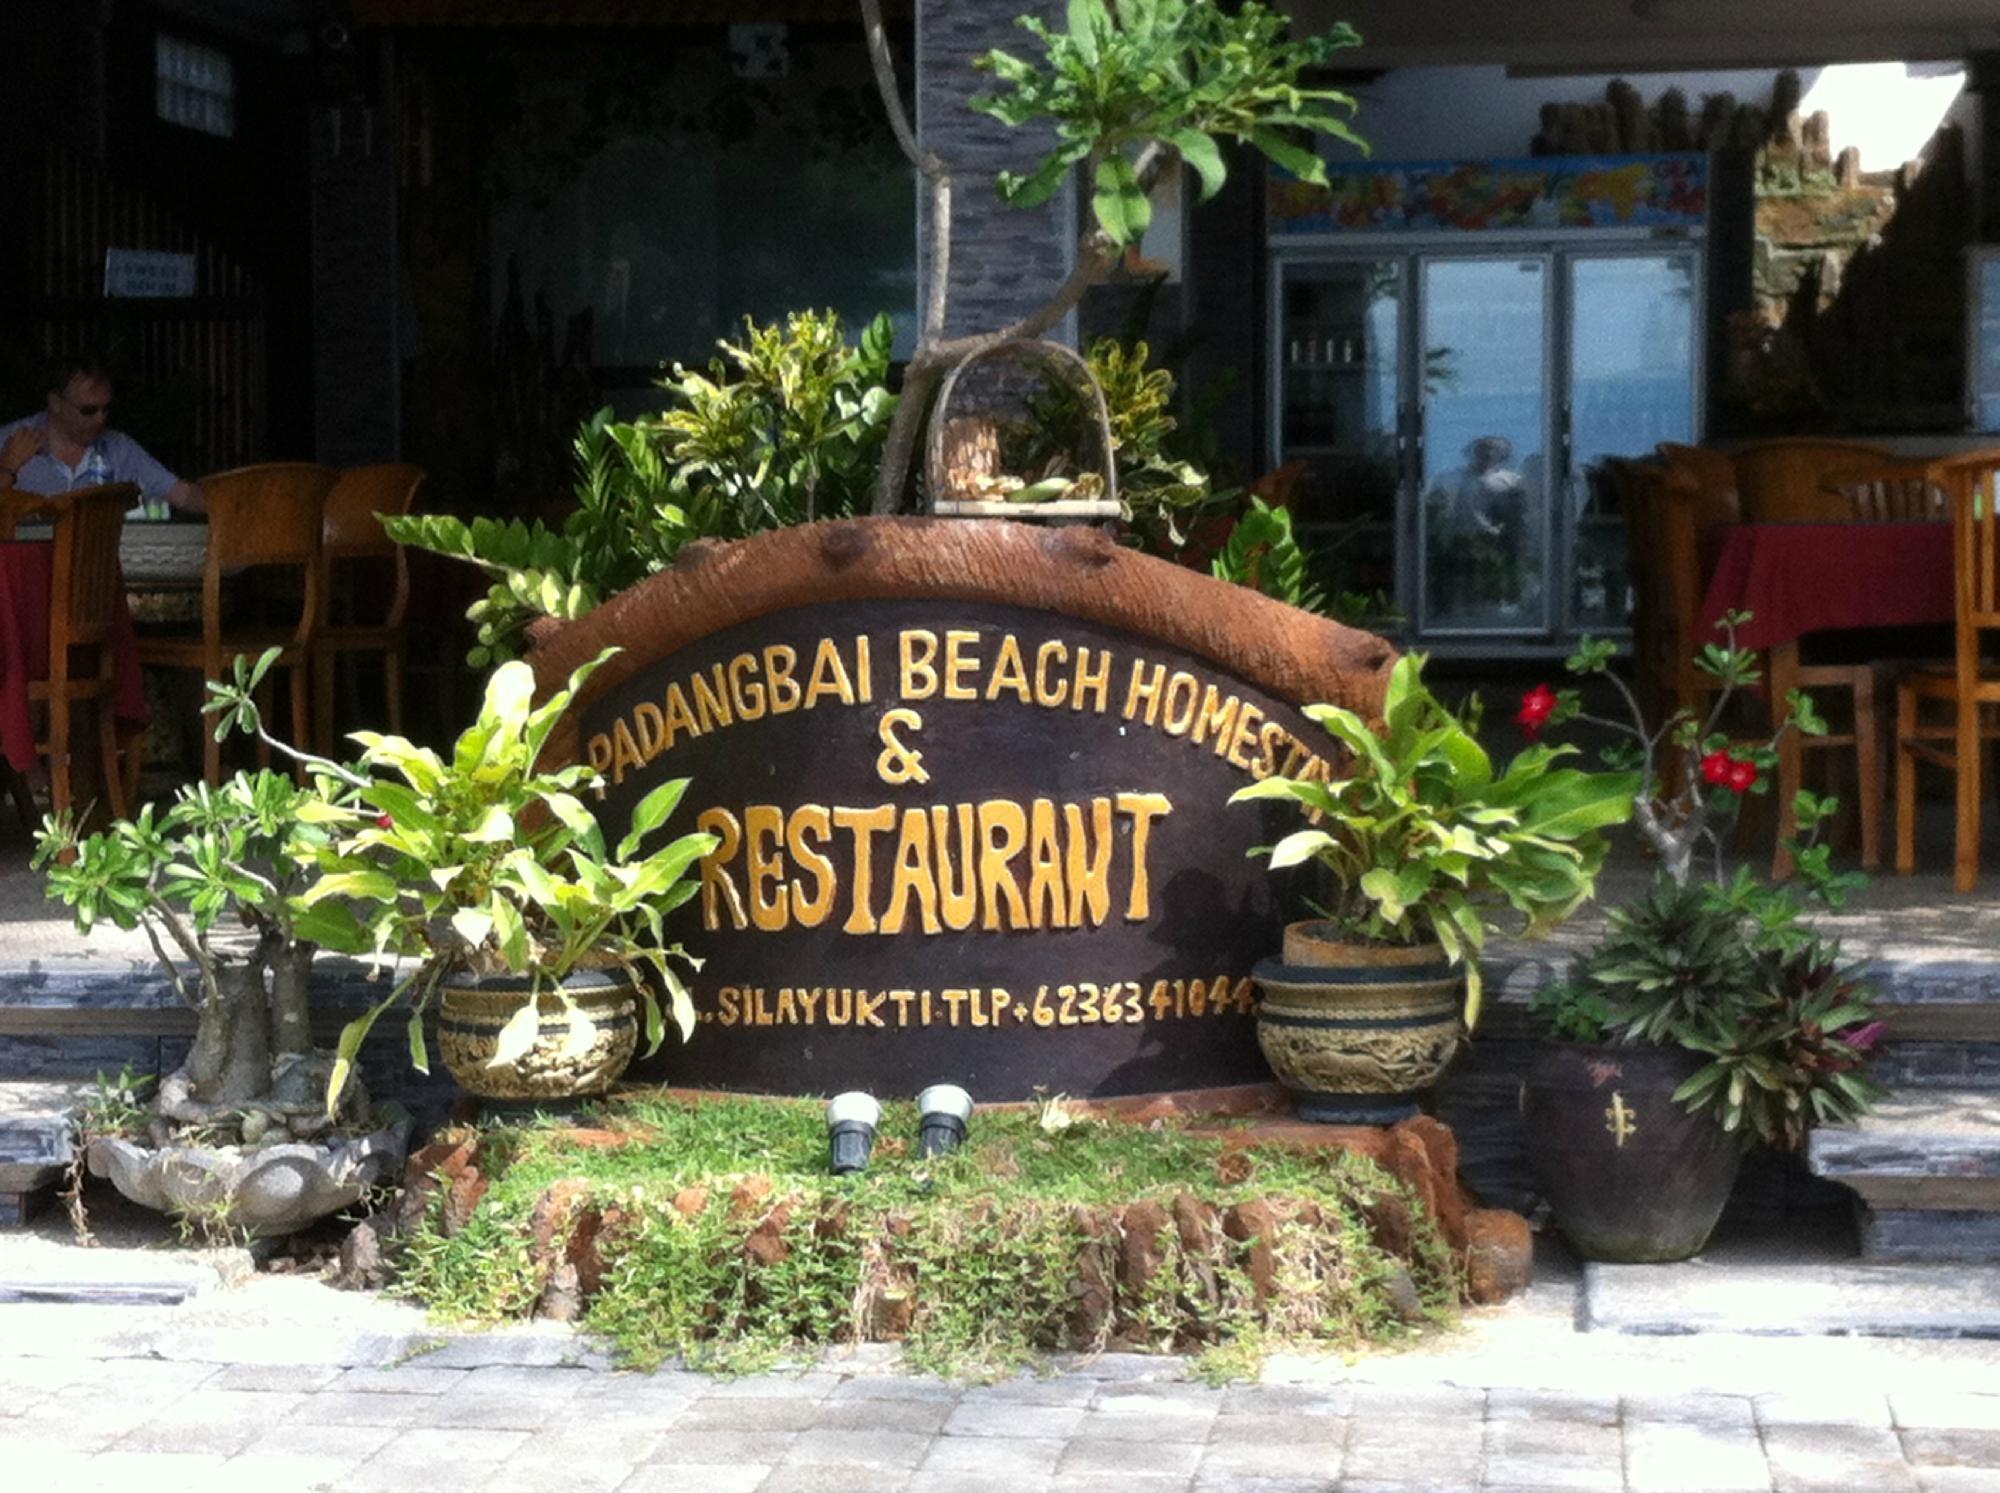 Padangbai Beach Homestay